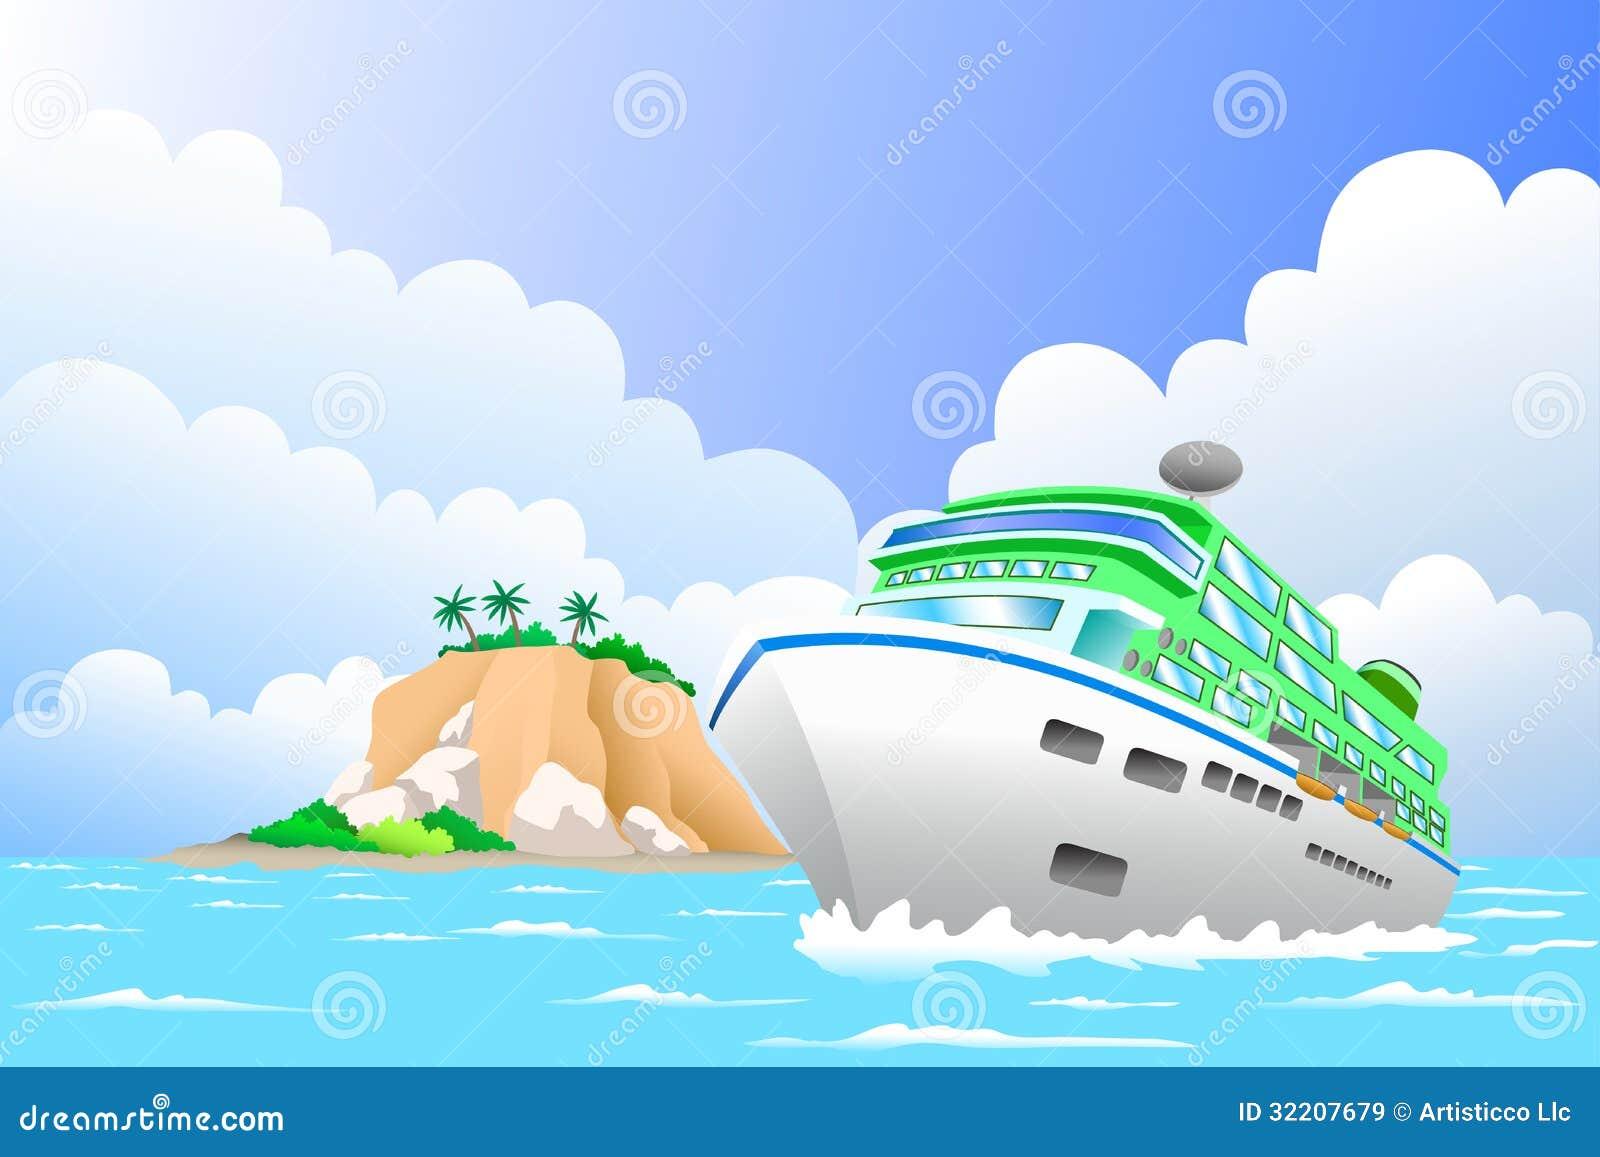 Cartoon Cruise Ship Of luxury cruise ship in